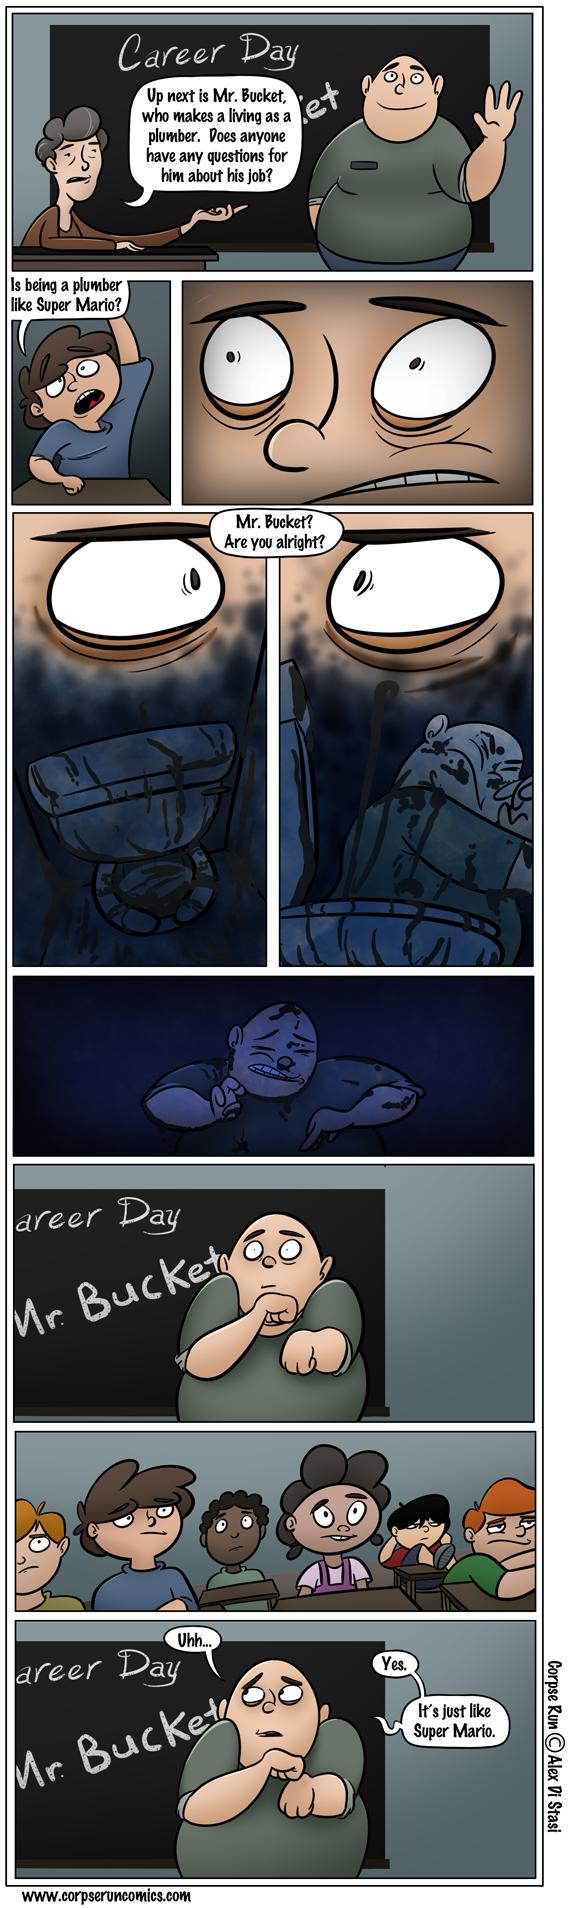 Corpse Run 253: Career Day